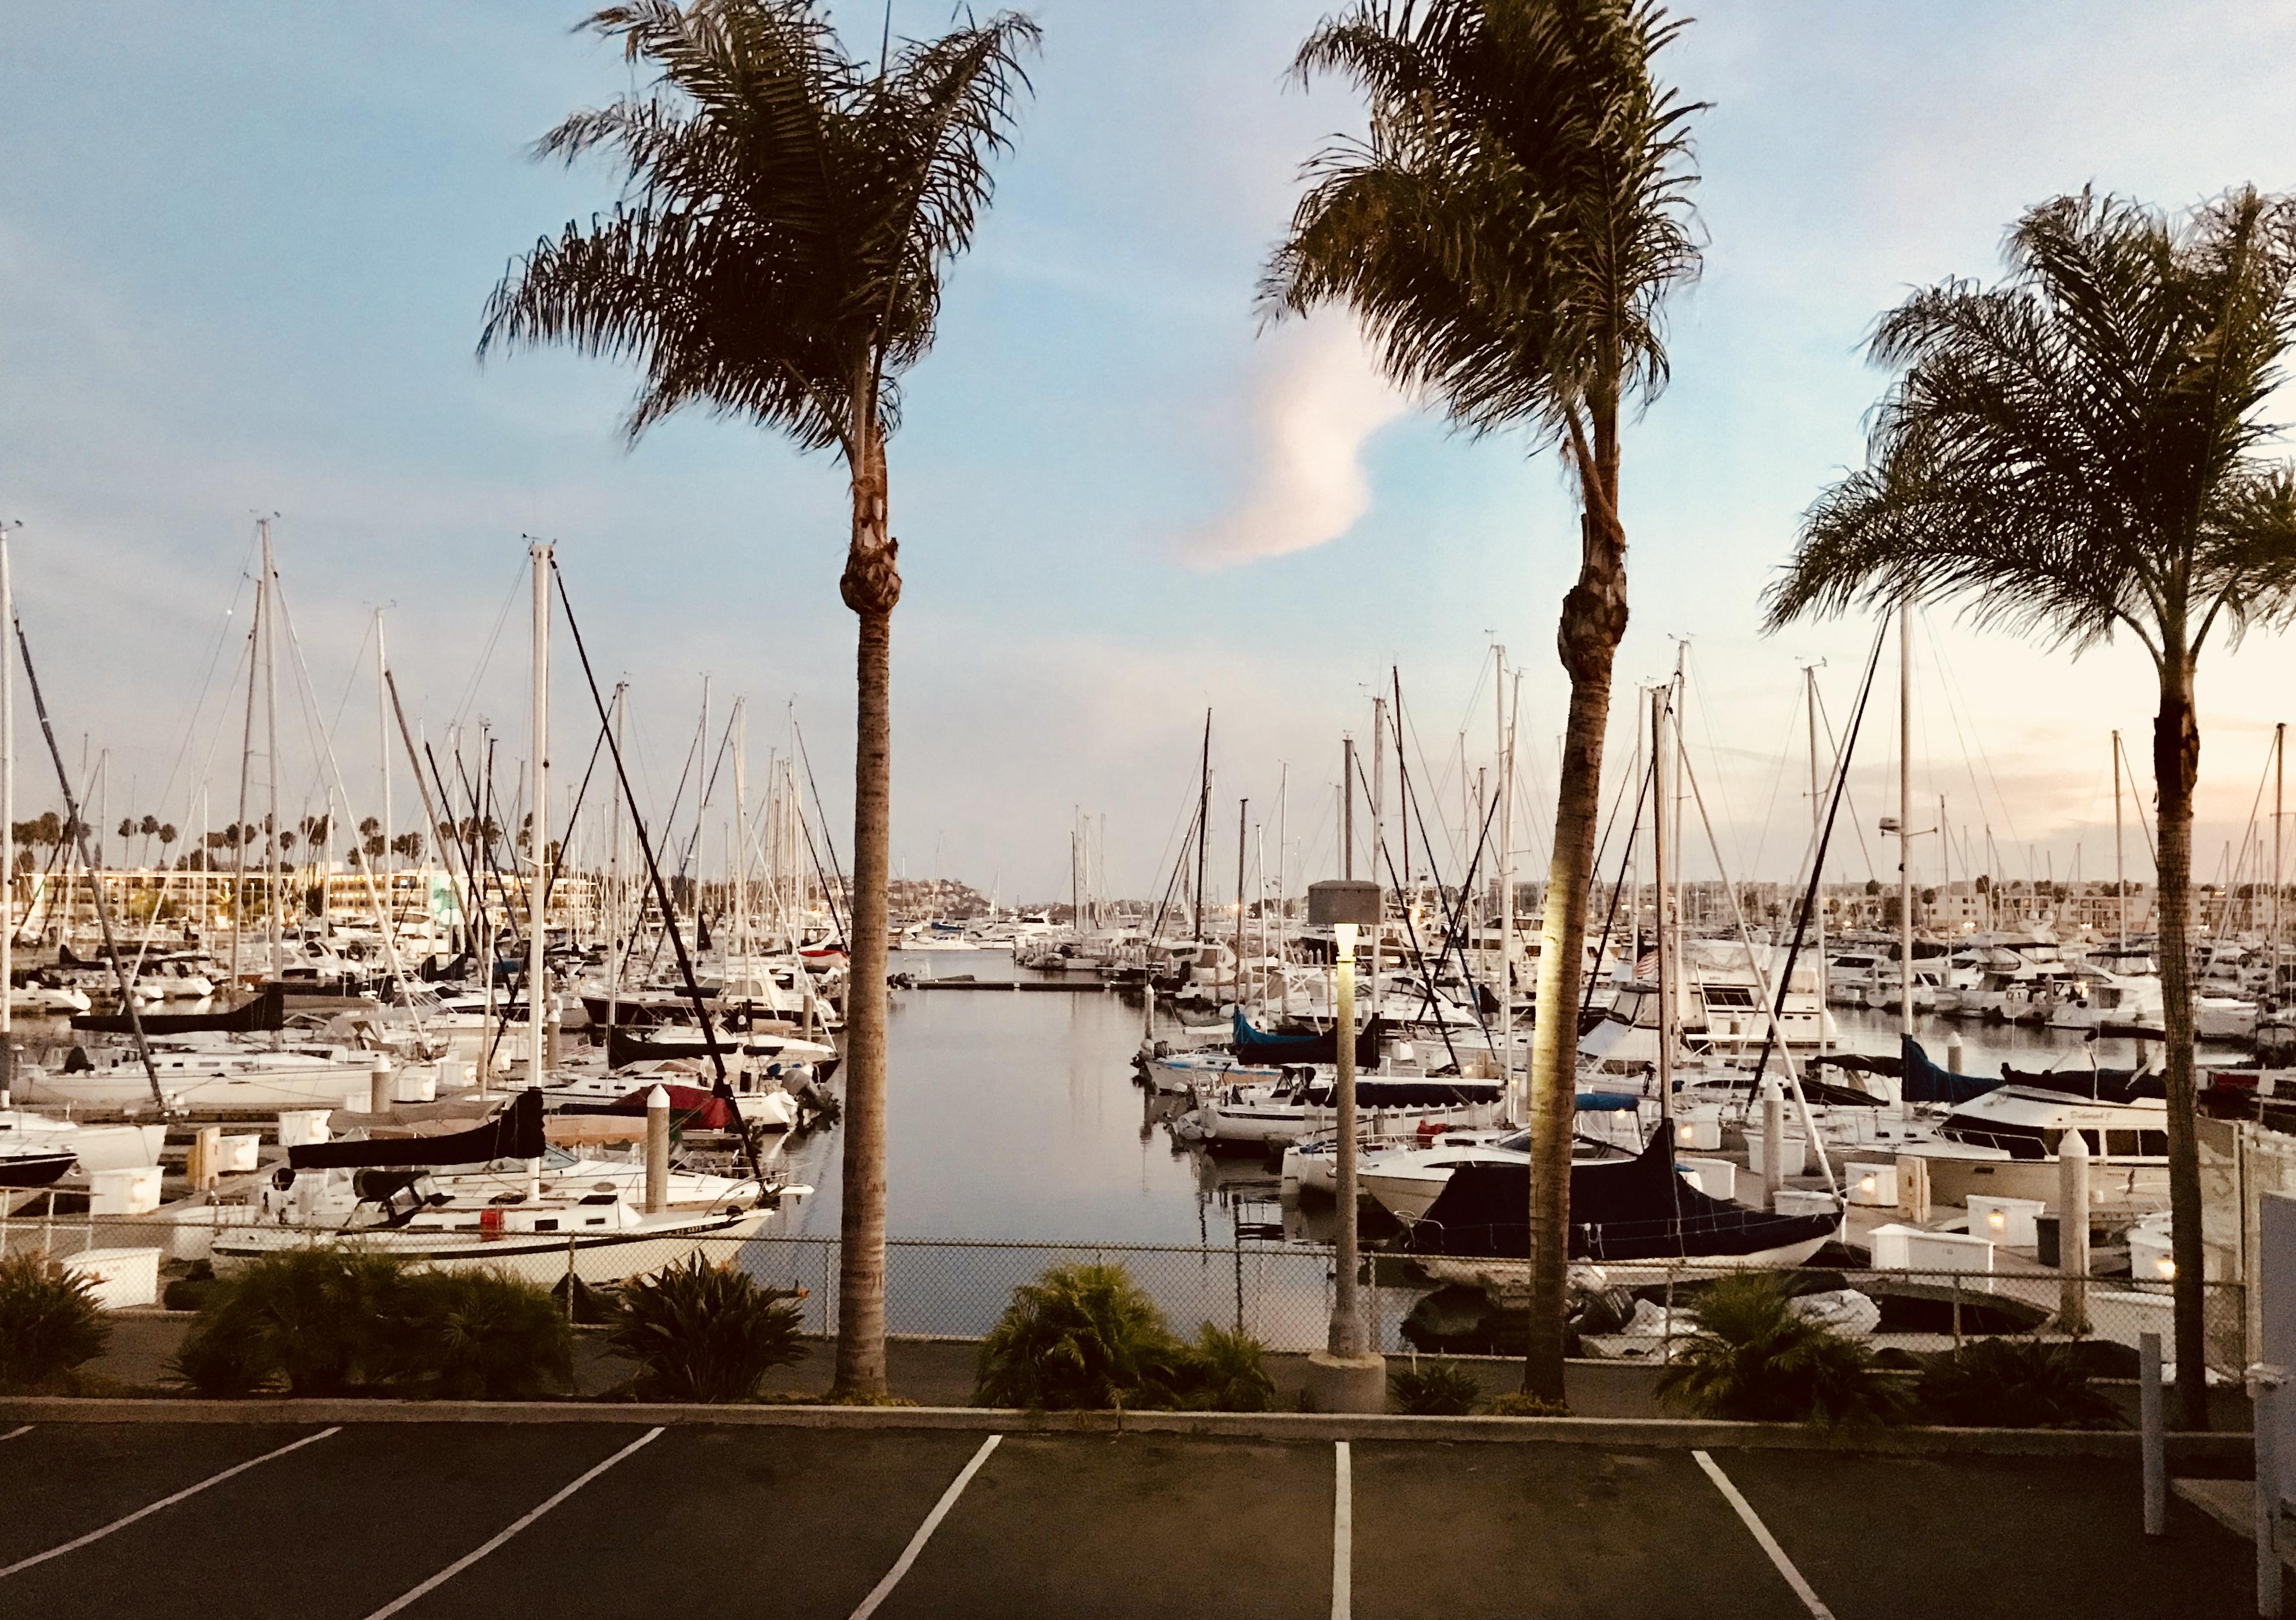 【南山韬客食尚札记】Marina Del Rey海港的Cafe Del Rey